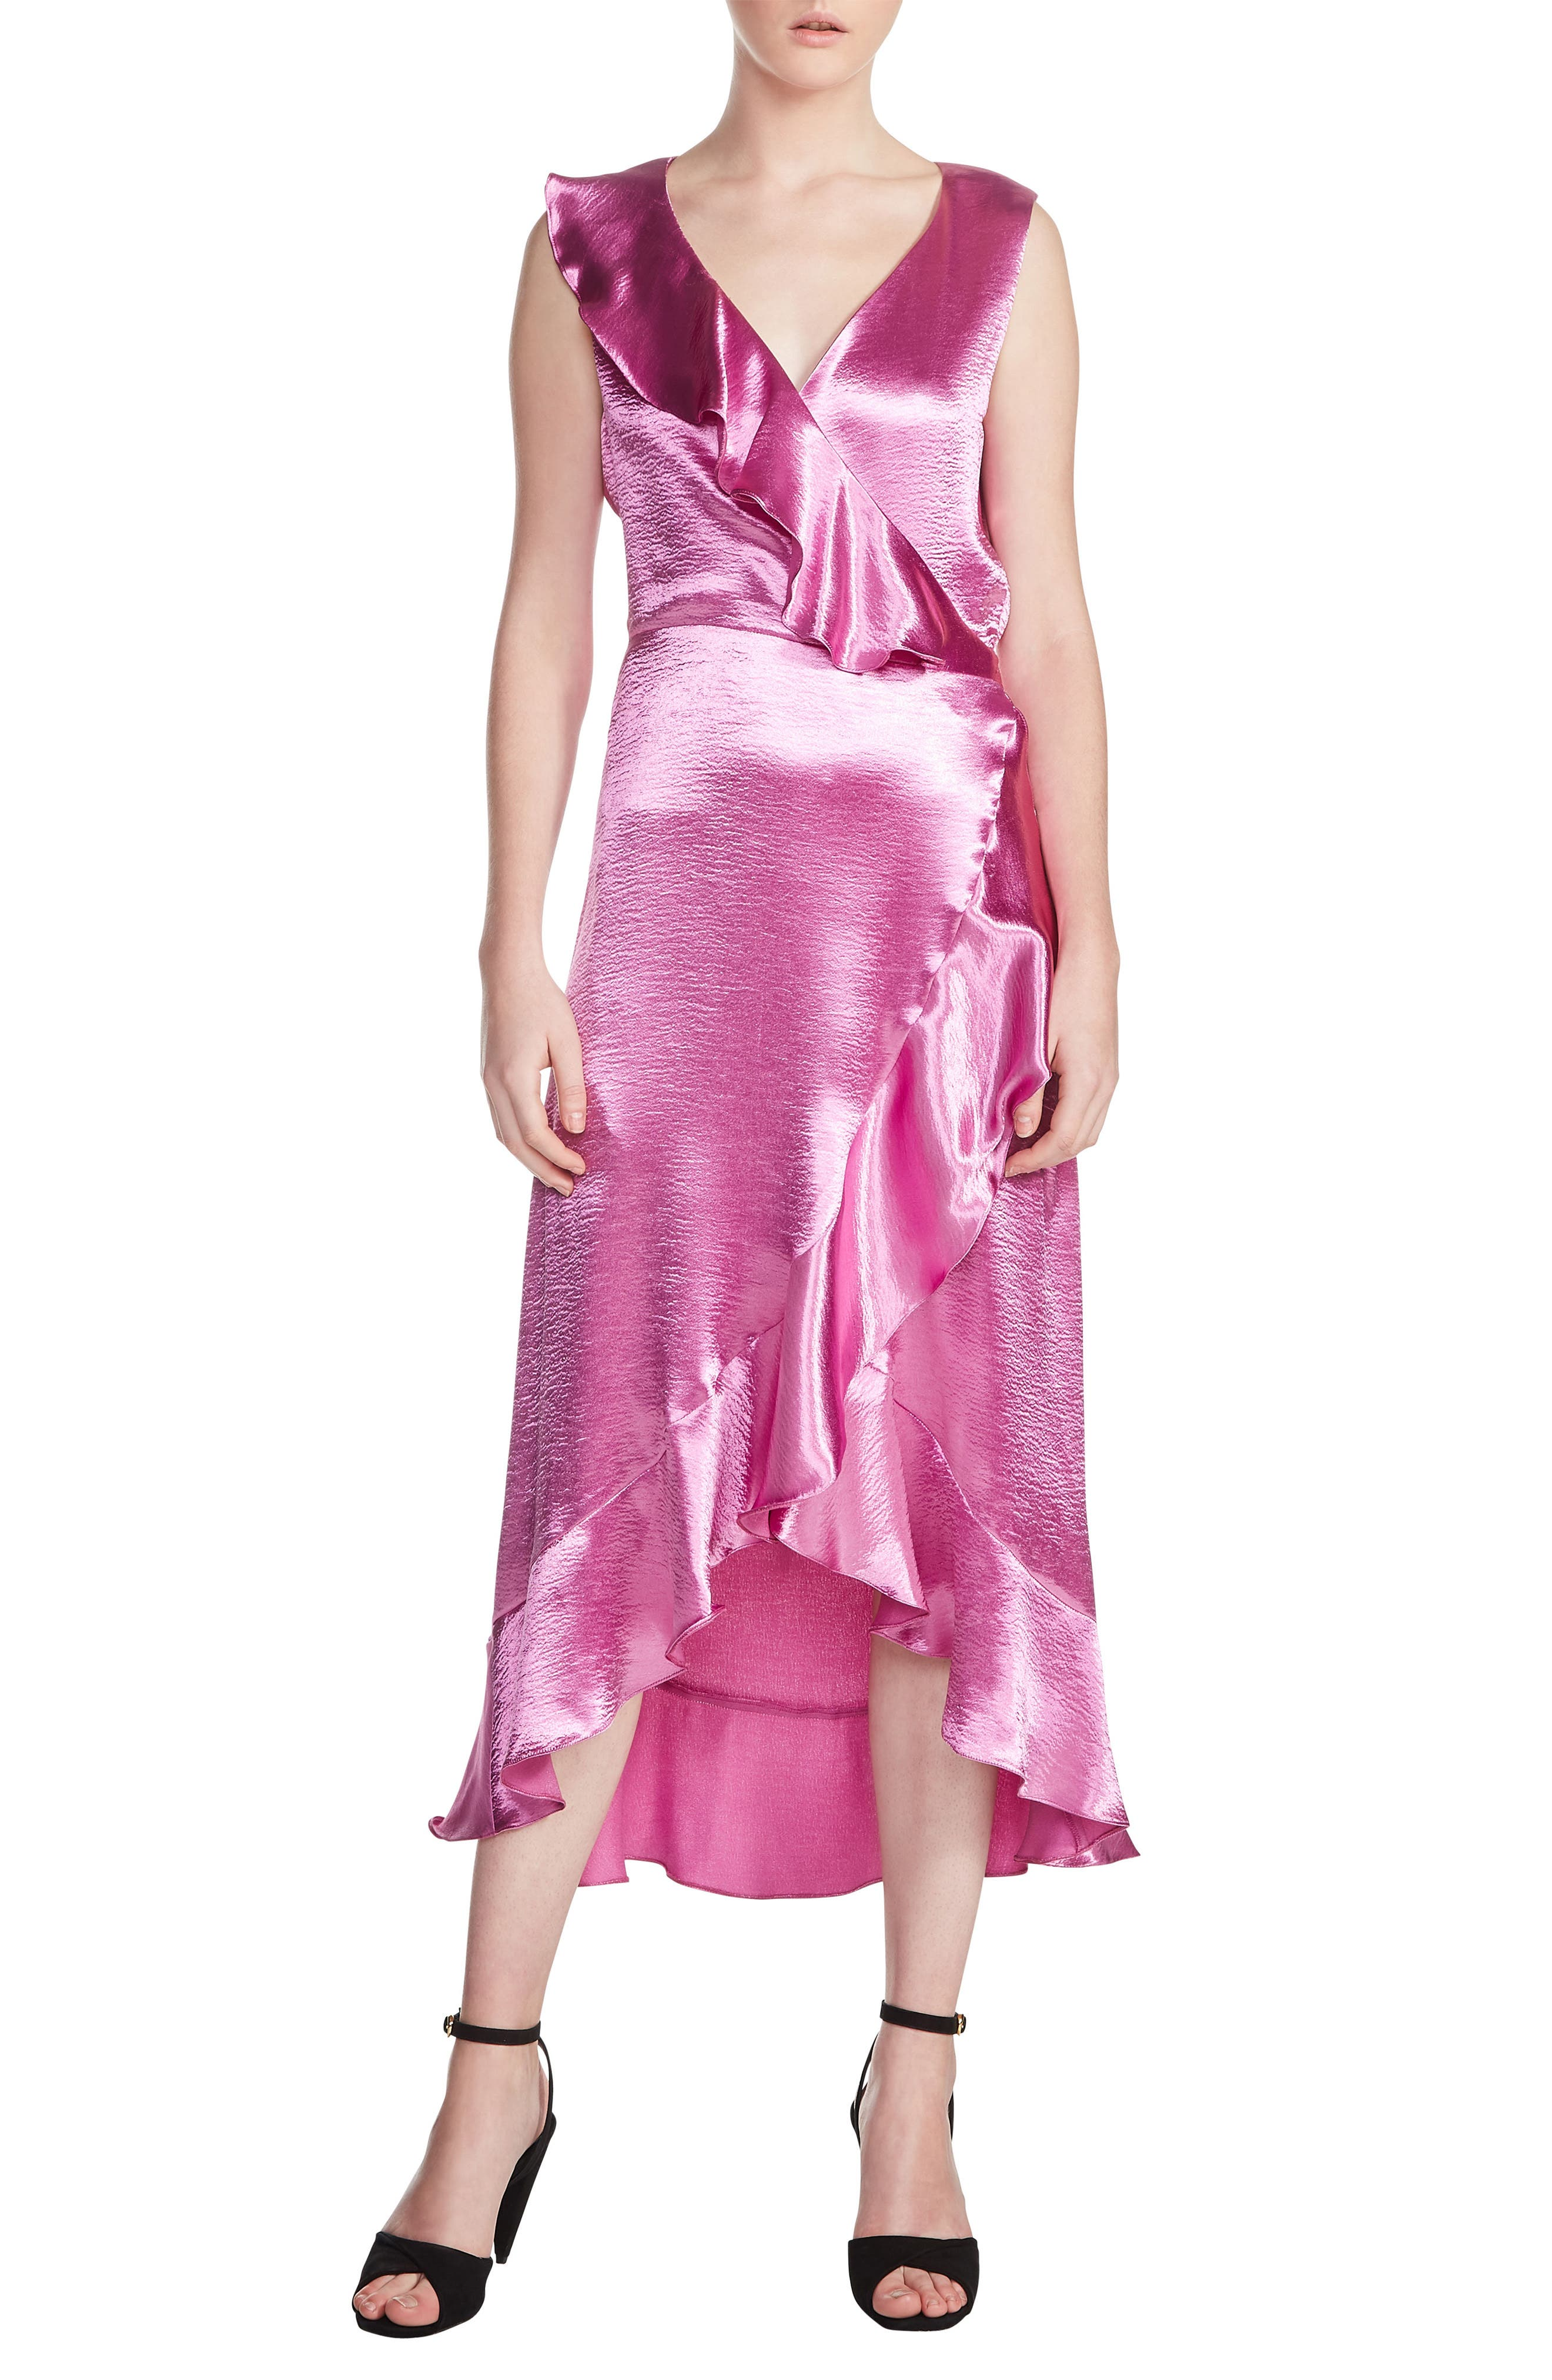 Ripple Ruffle Detail Satin Wrap Dress,                             Main thumbnail 1, color,                             650